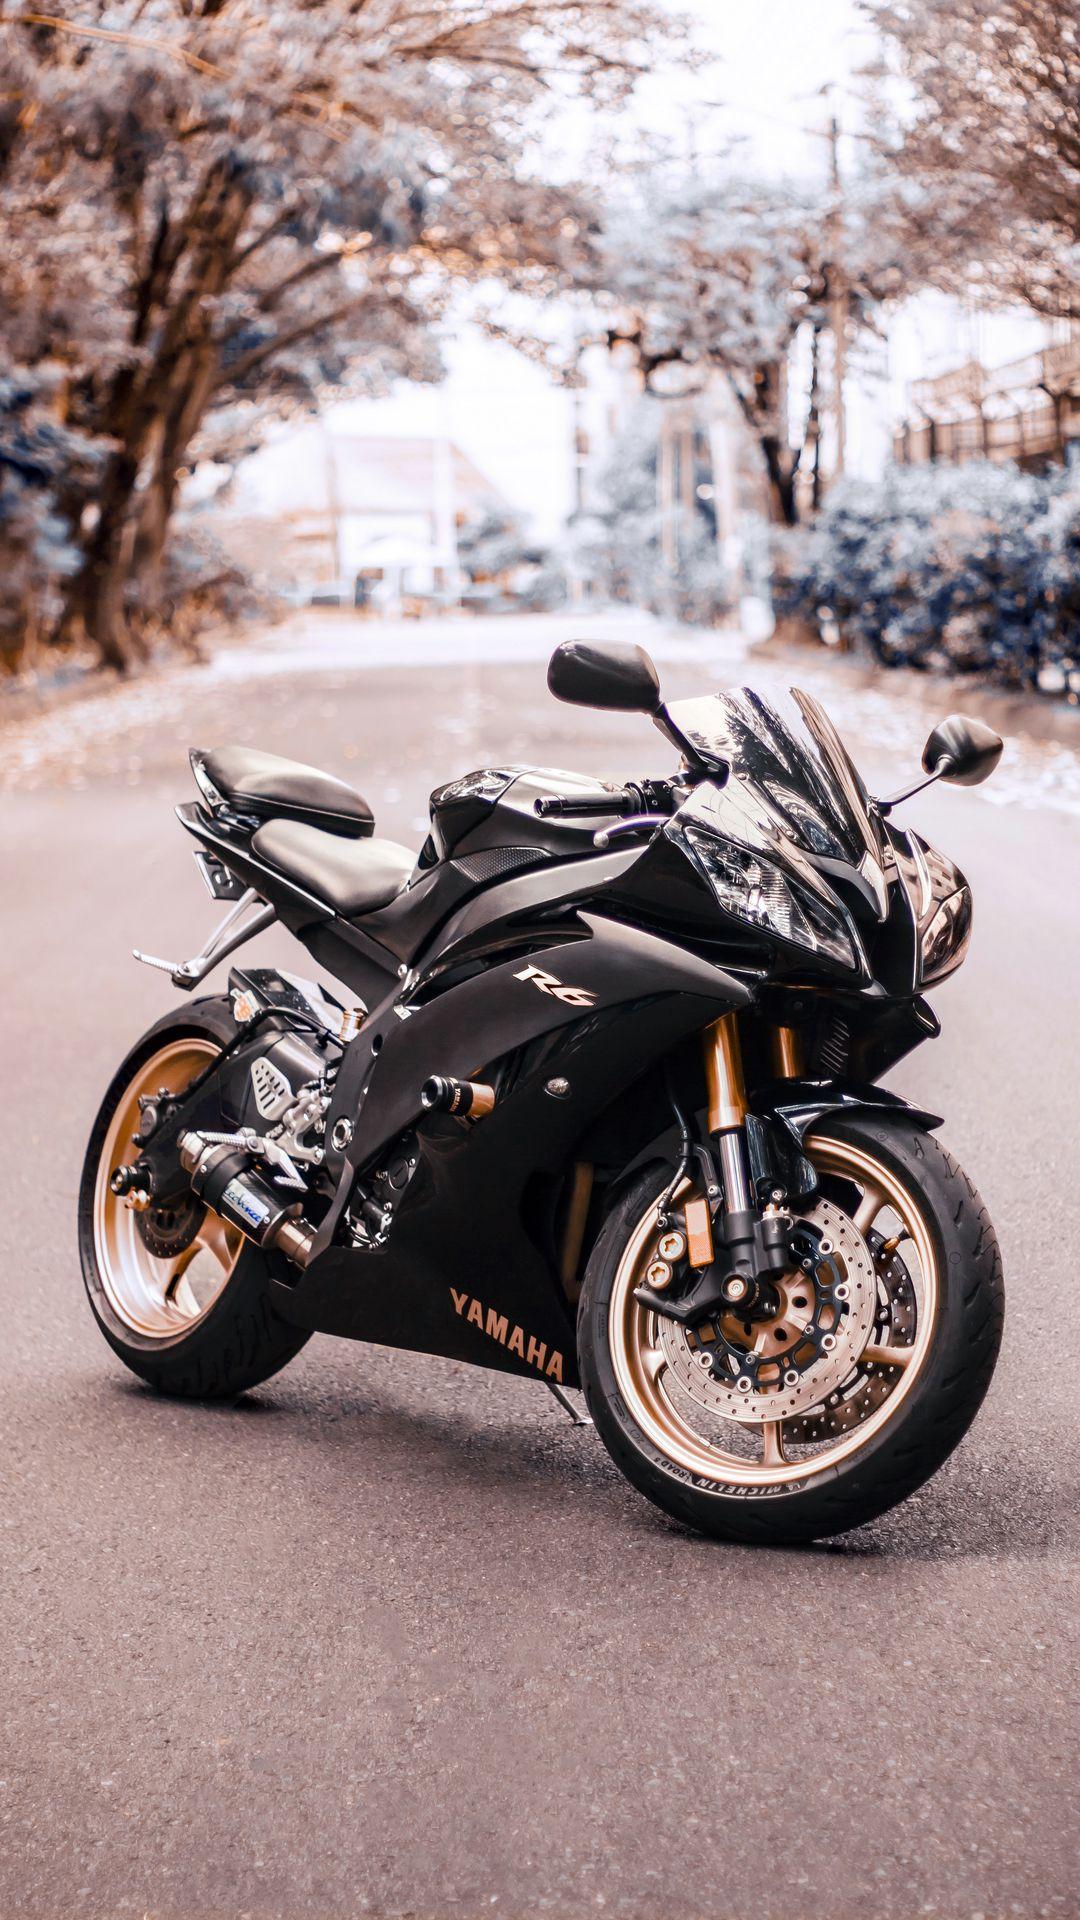 Hd Wallpaper Black Yamaha R6 Side View